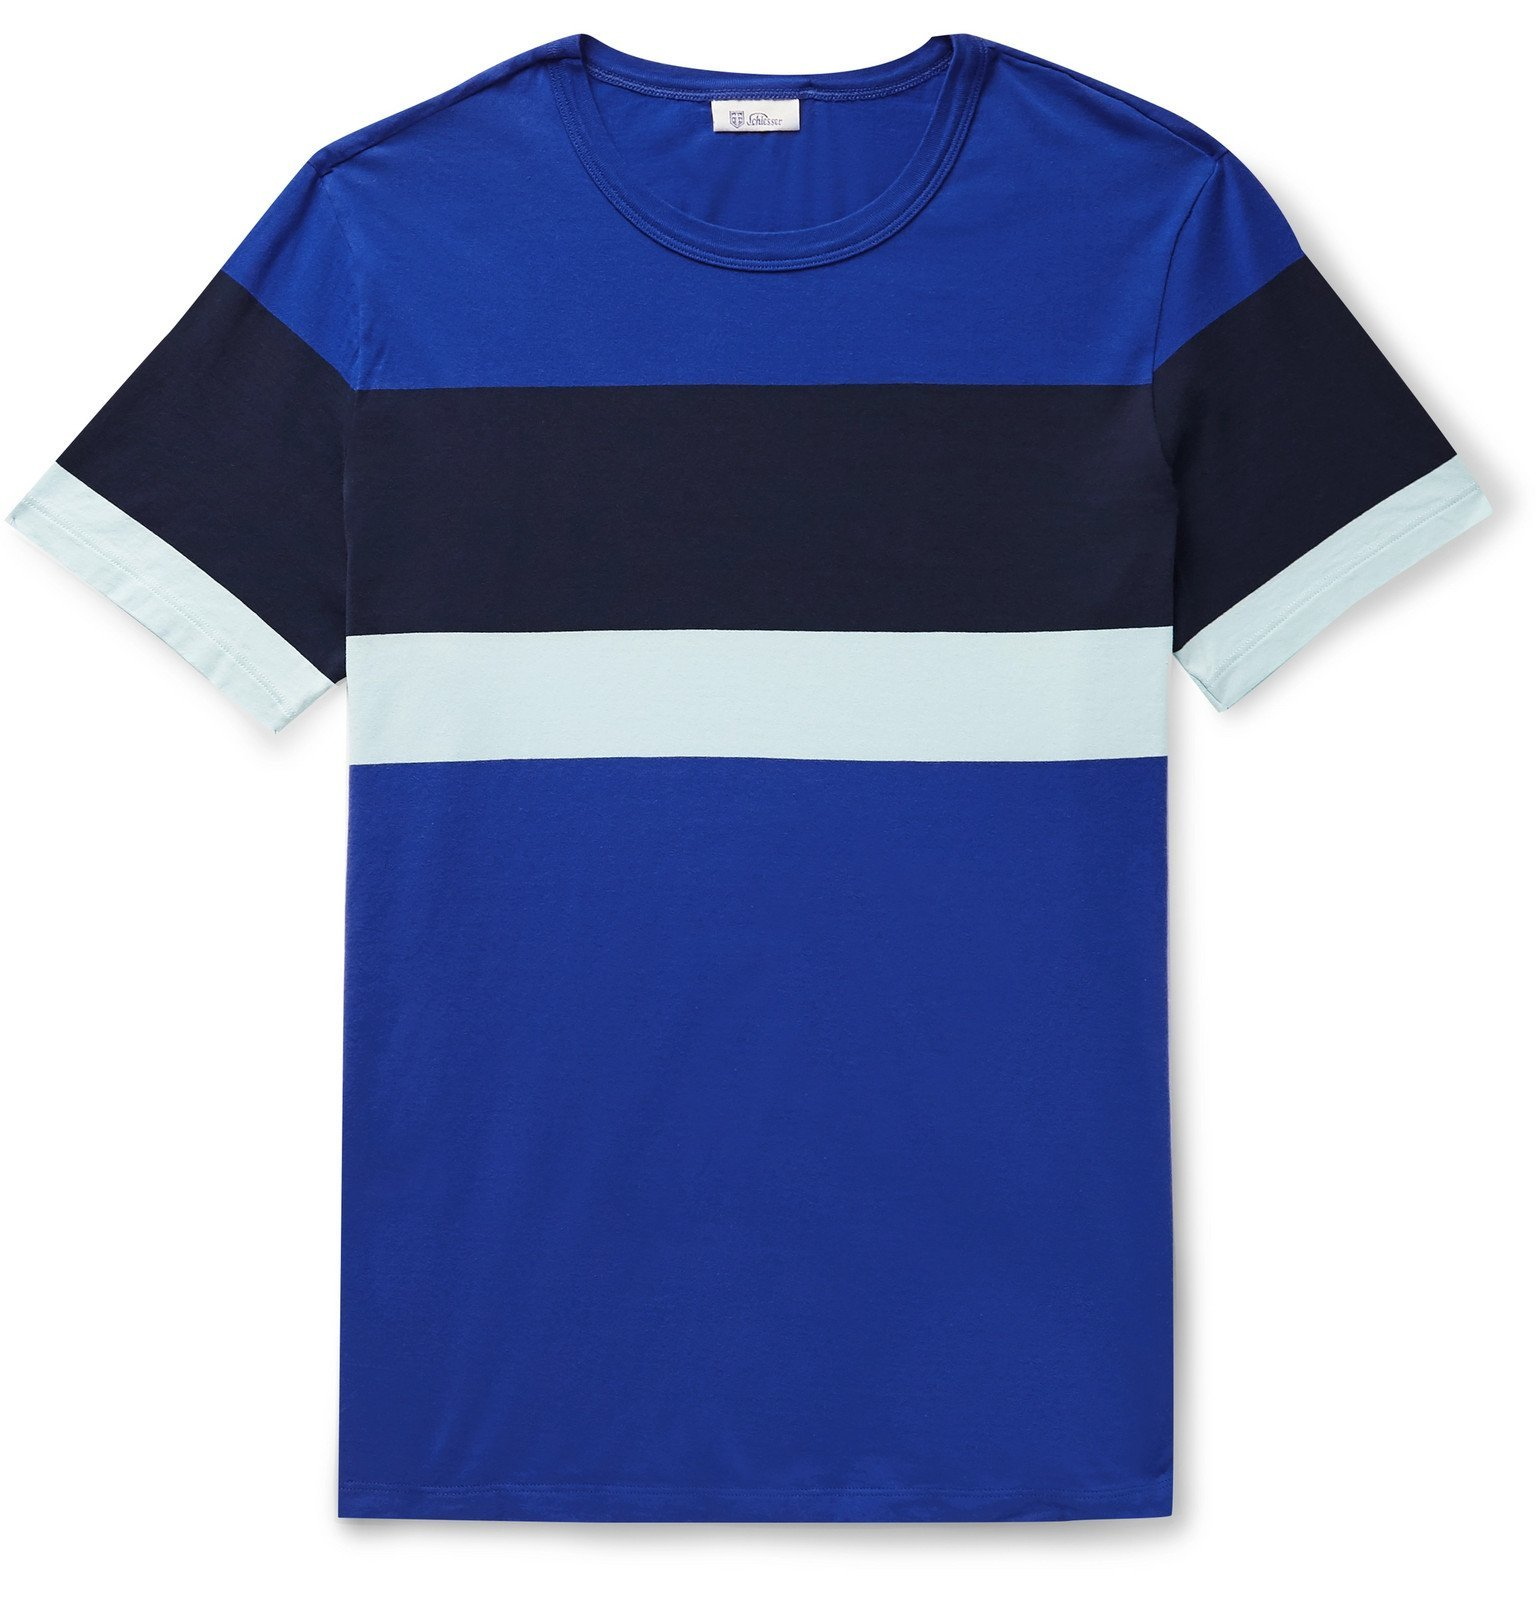 Schiesser - Striped Cotton-Jersey T-Shirt - Blue